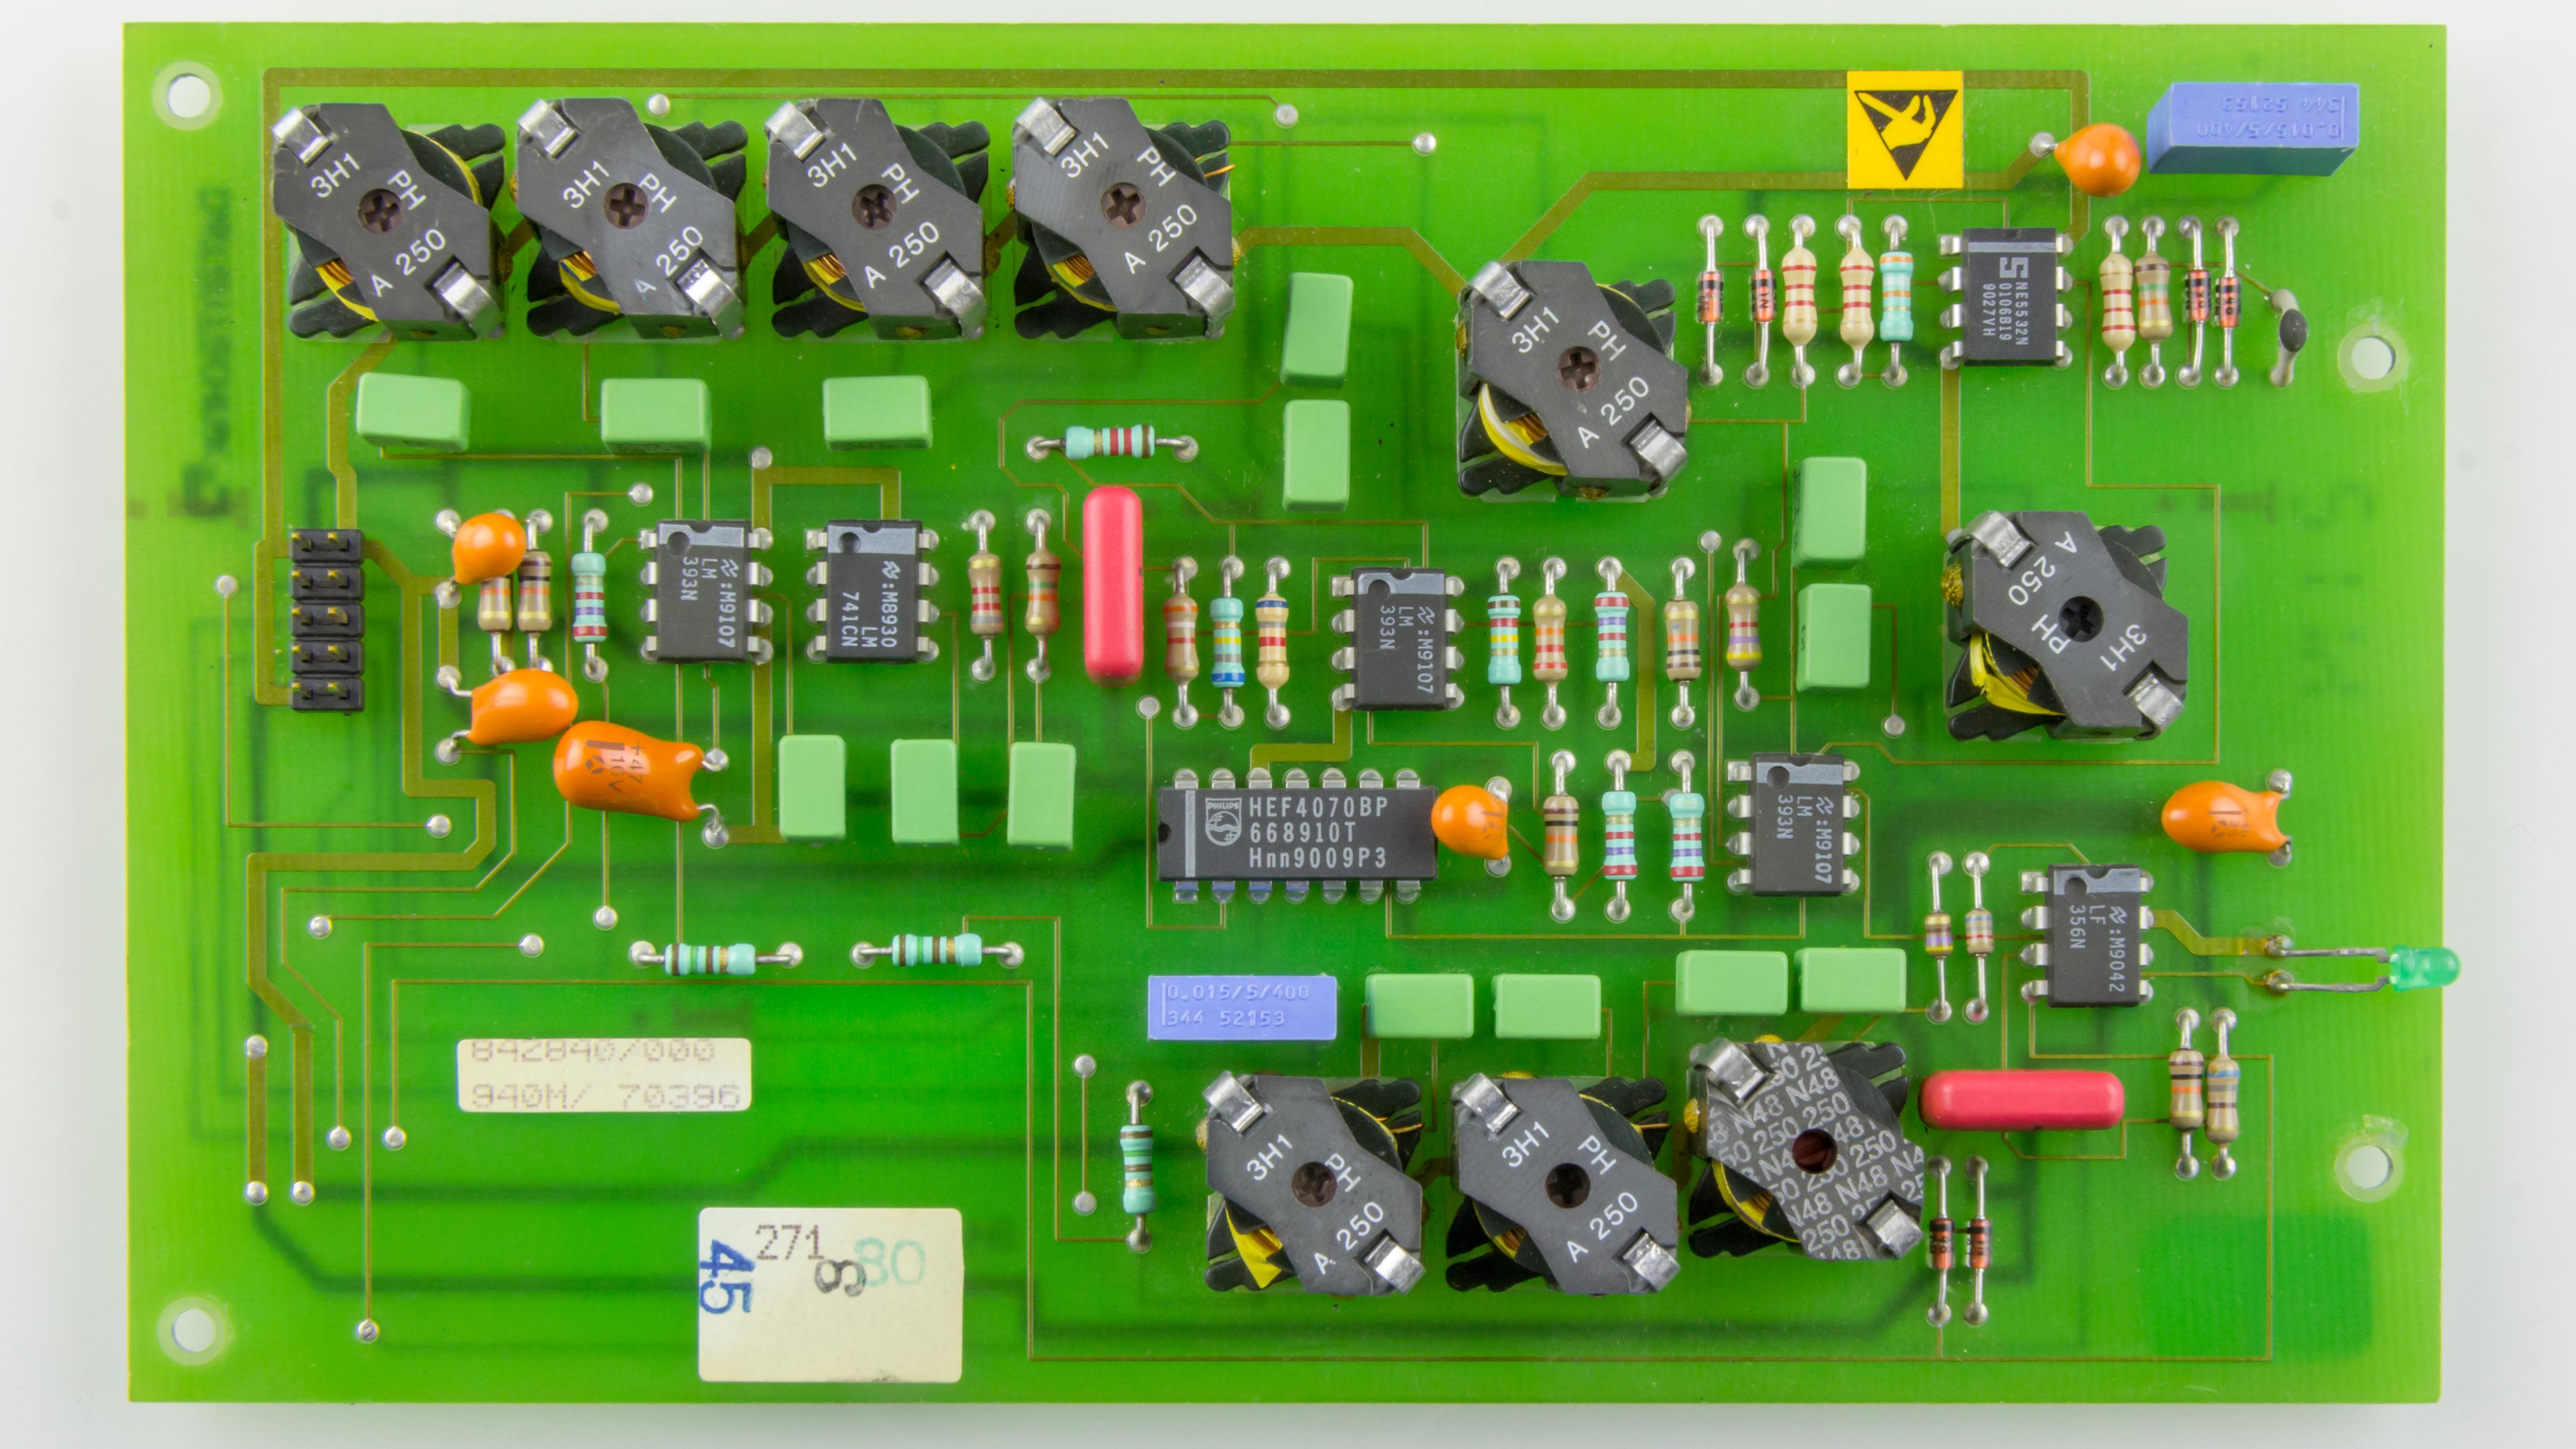 Filedov 1x Printed Circuit Board 9784 Wikimedia Commons Cheap Boards